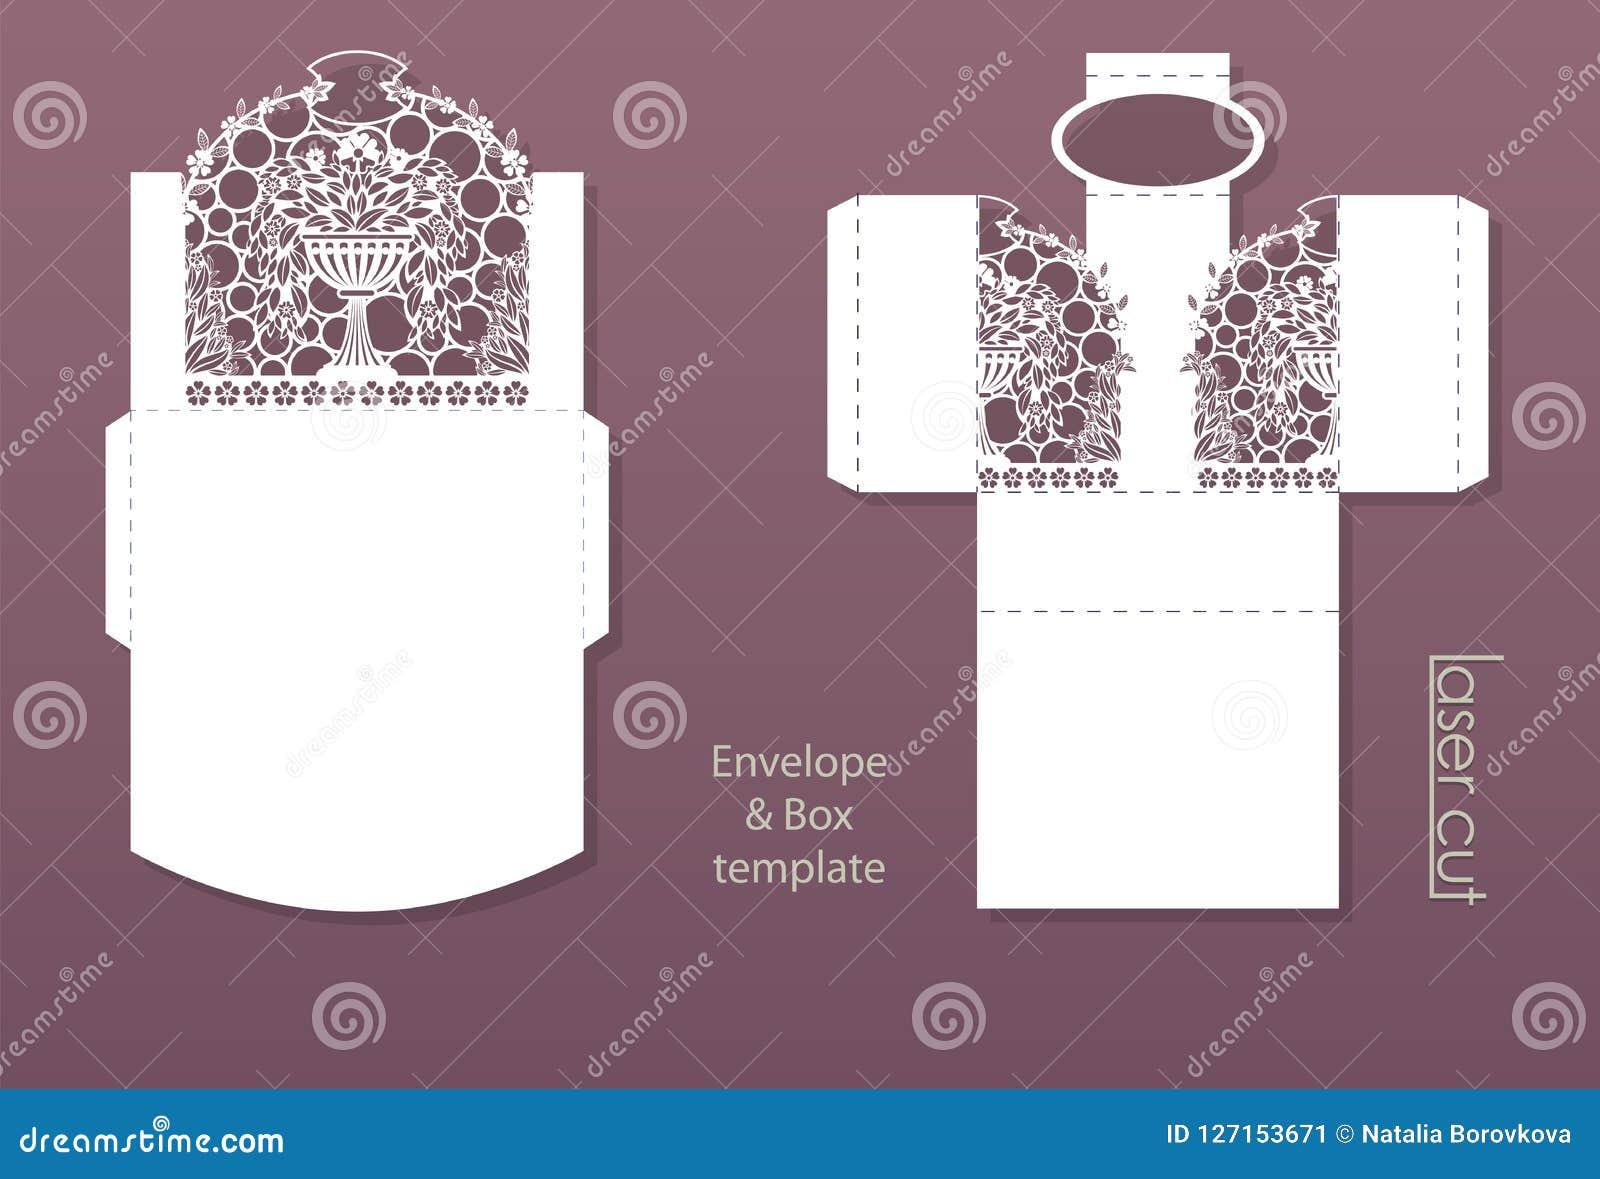 laser cut pattern envelope design for invitation cards flowerpot